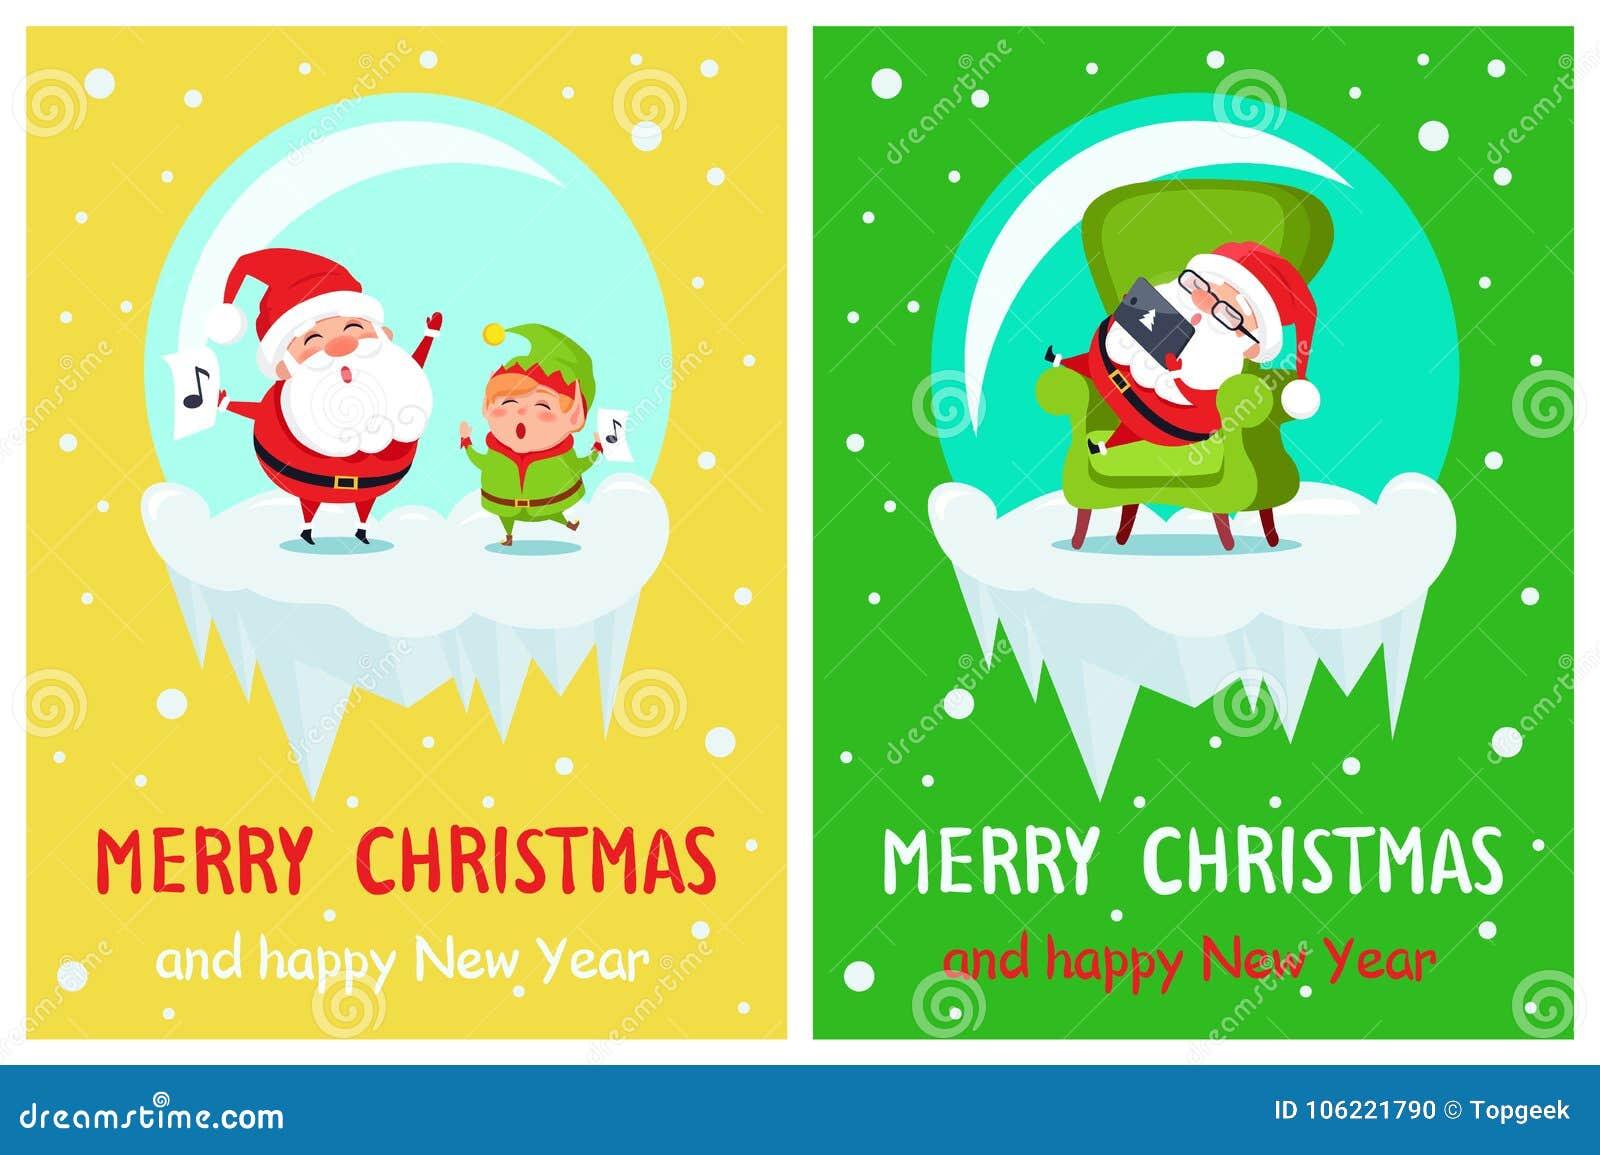 download merry christmas elf and santa vector illustration stock vector illustration of christmas isolated - Merry Christmas Elf